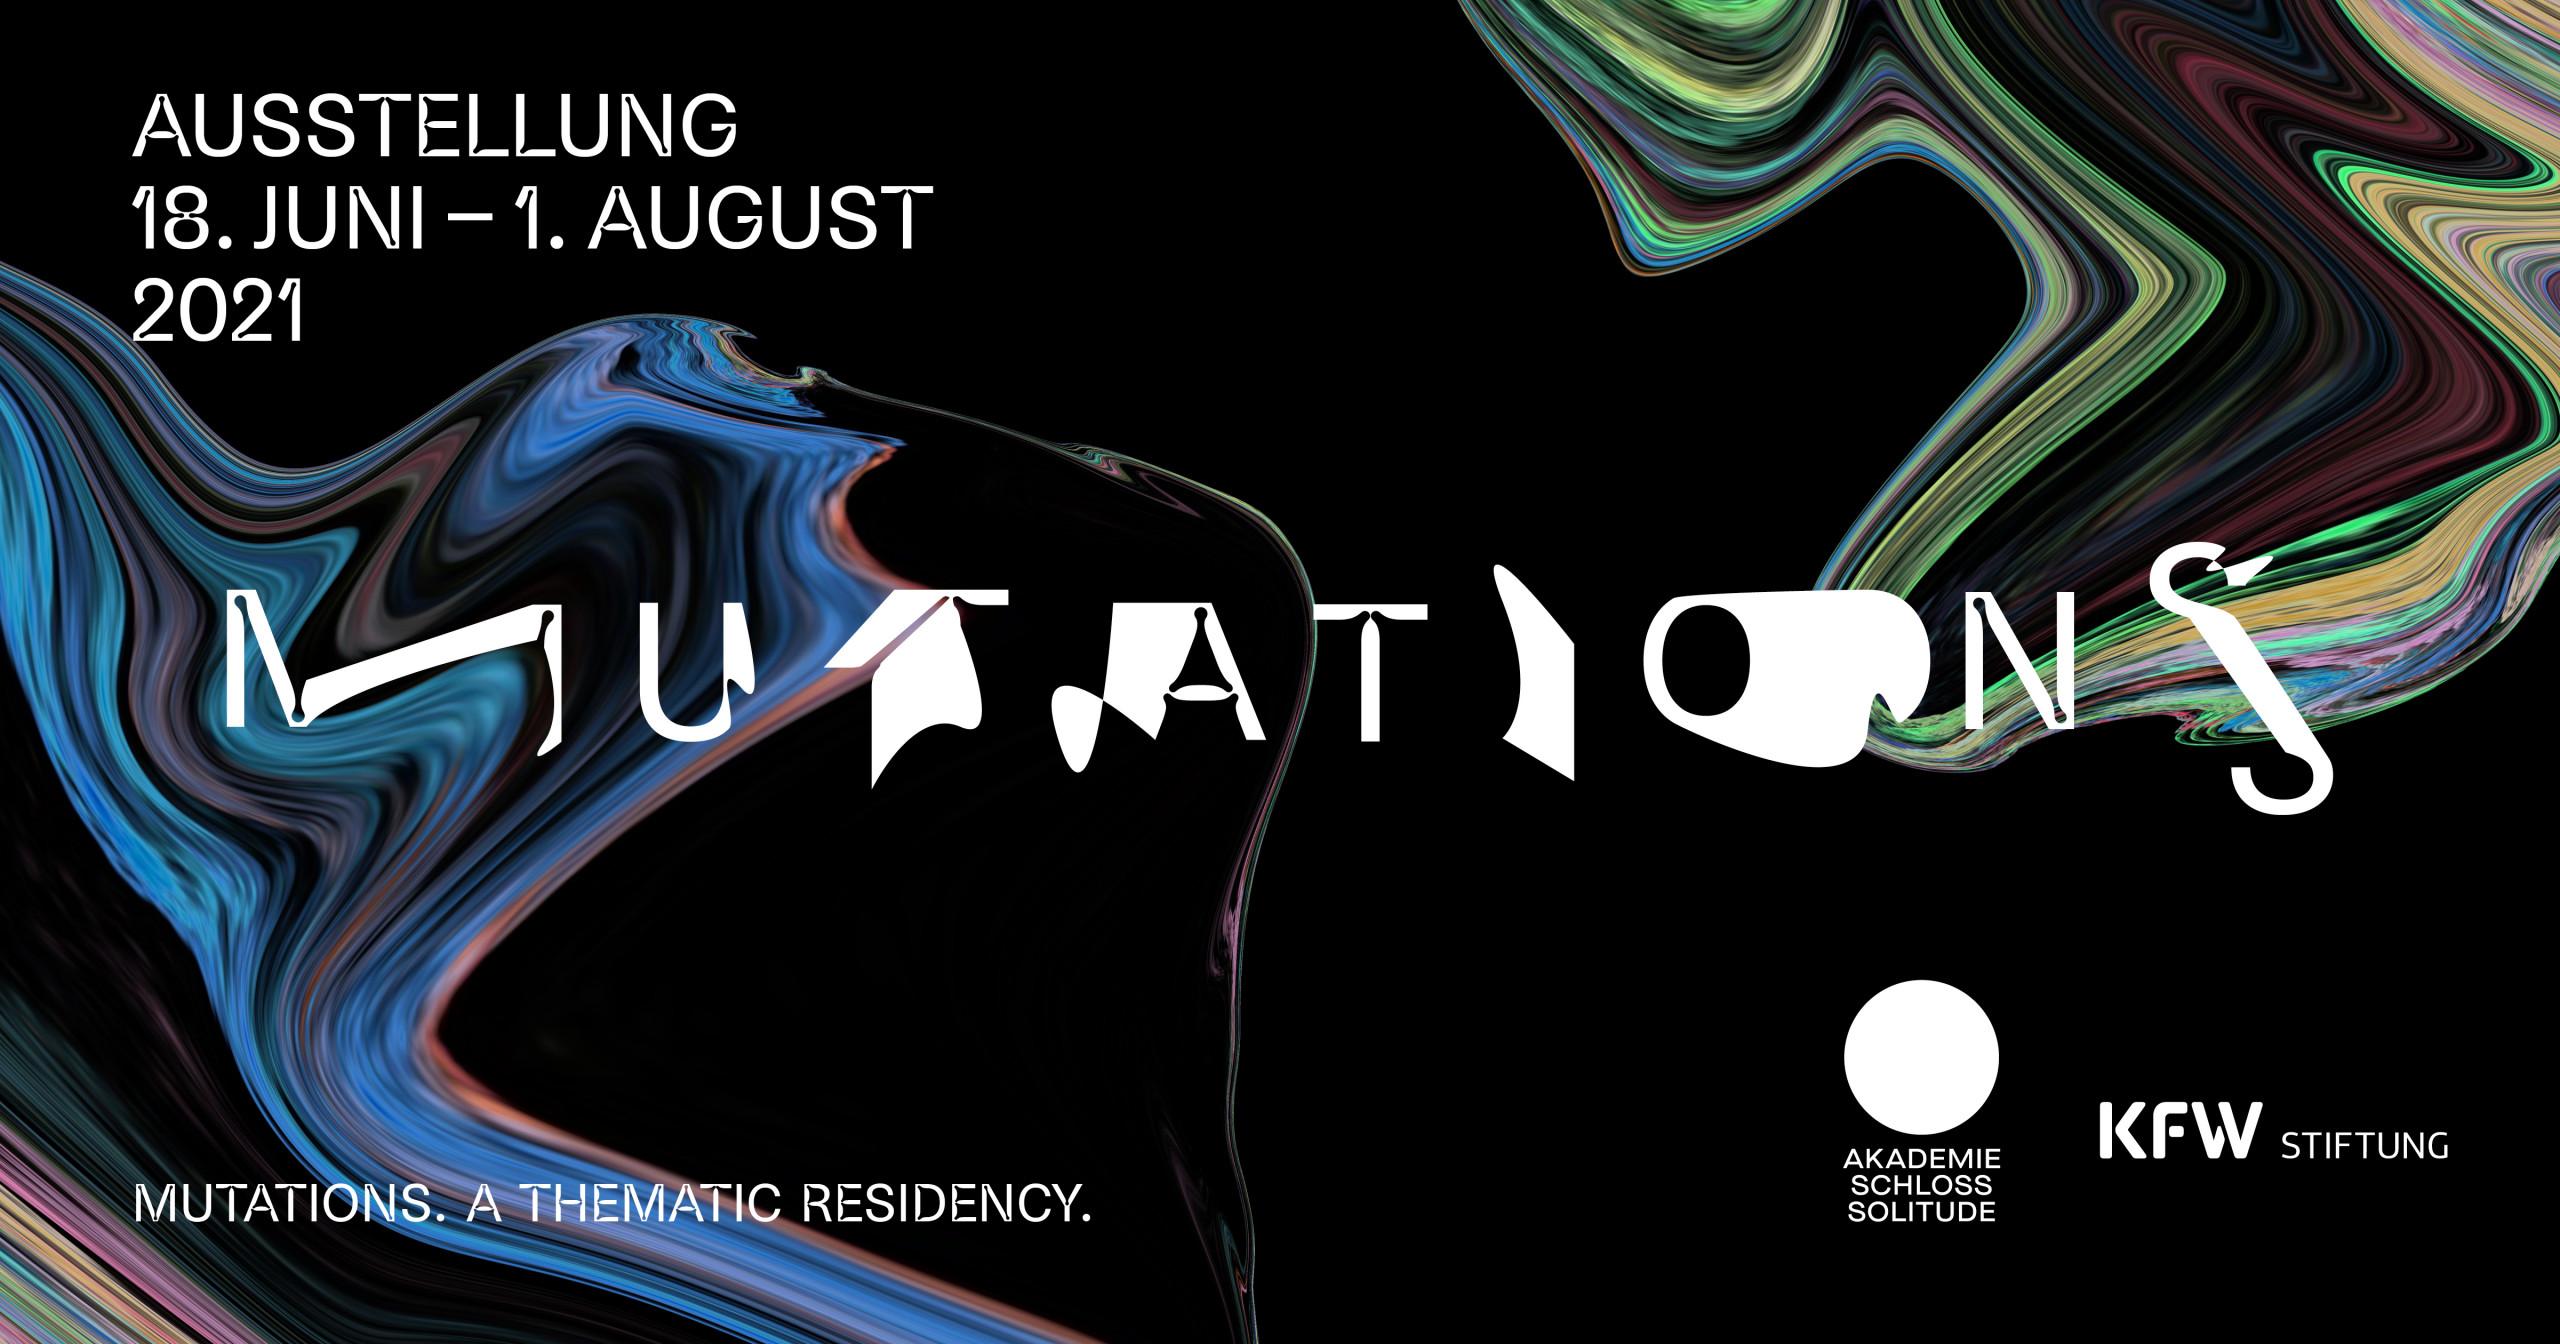 Mutations exhibition